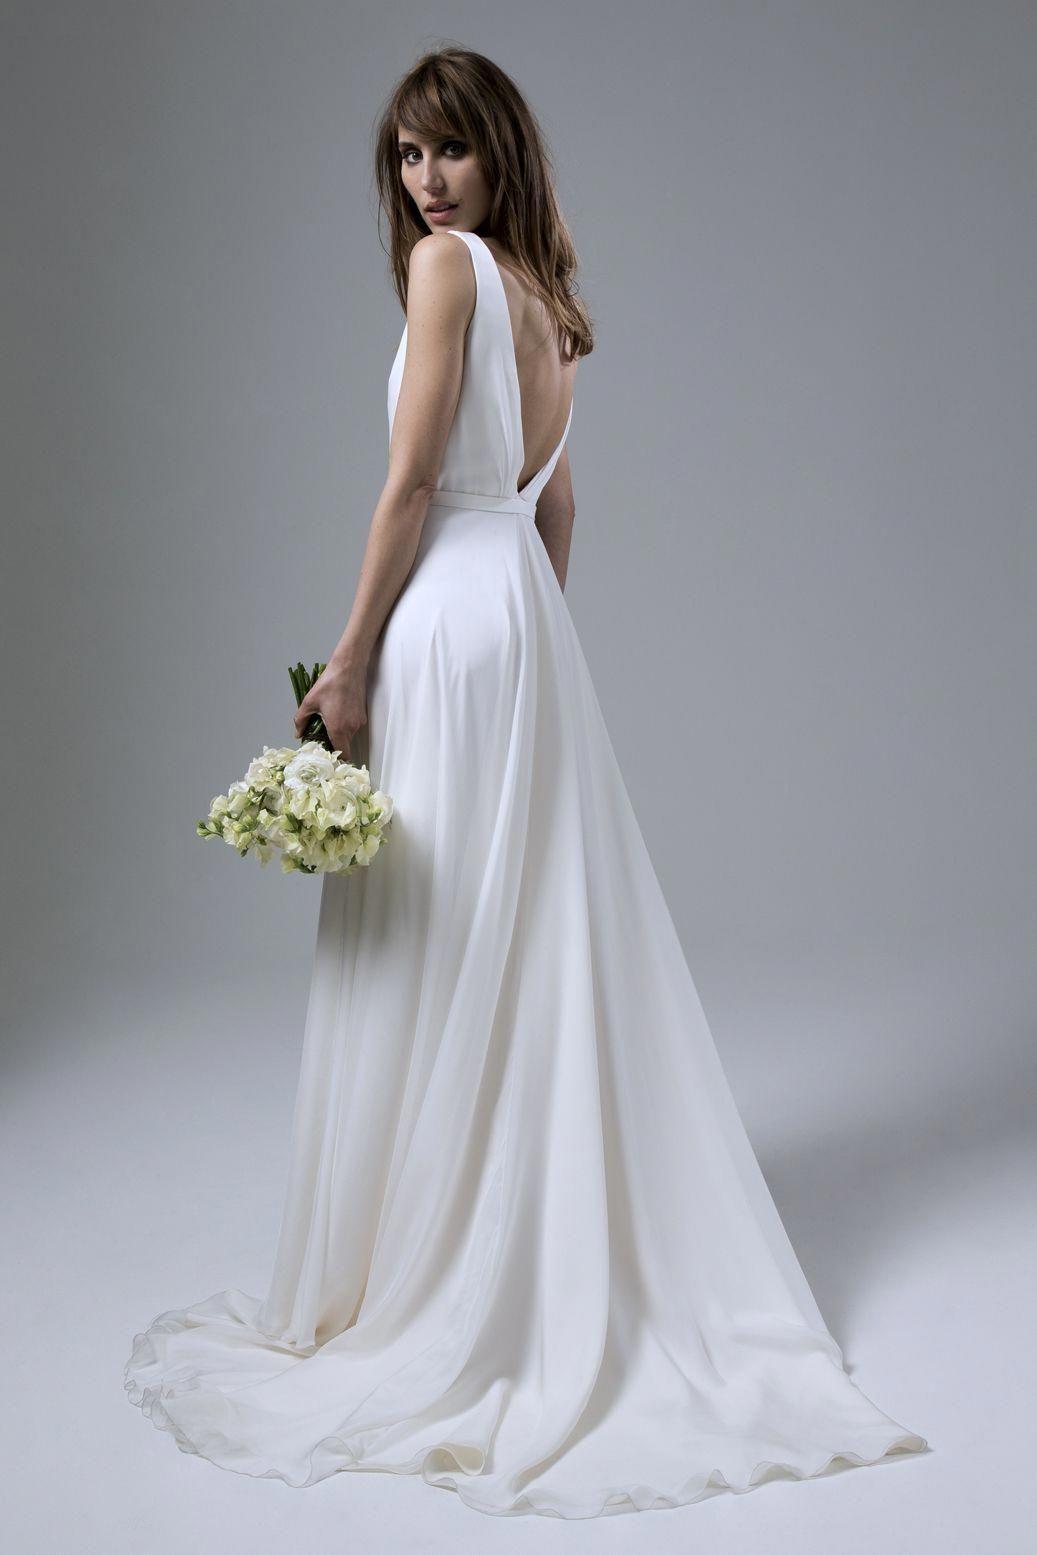 Wedding dress by Halfpenny London Bridal Fashion by Kate Halfpenny